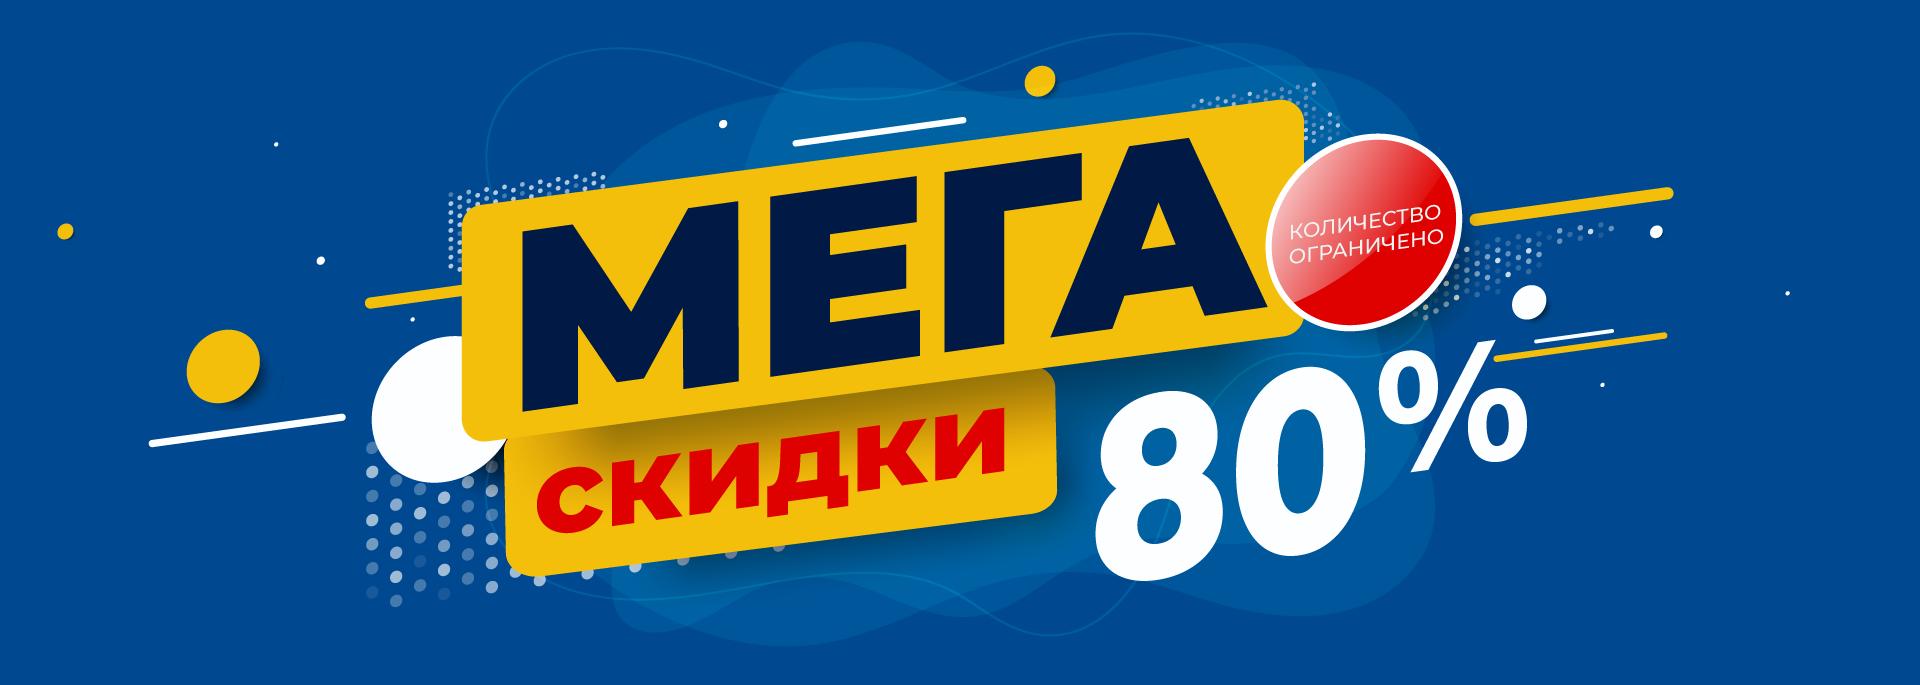 1920х685-ру